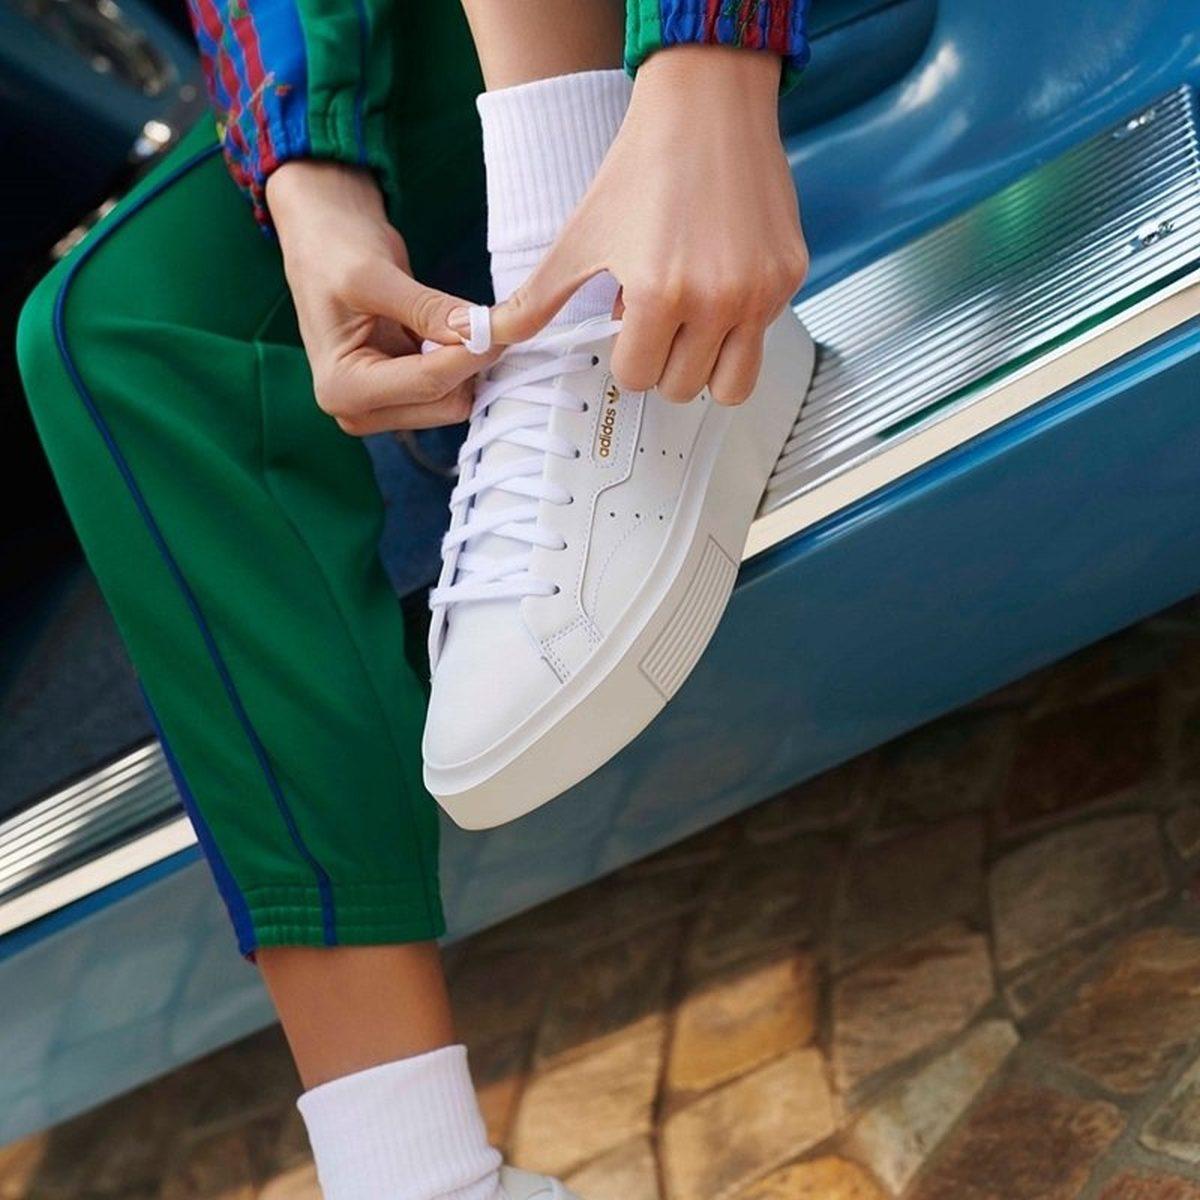 Scr Pl Adidas Originals Sleek Super Ef8858 22292 3